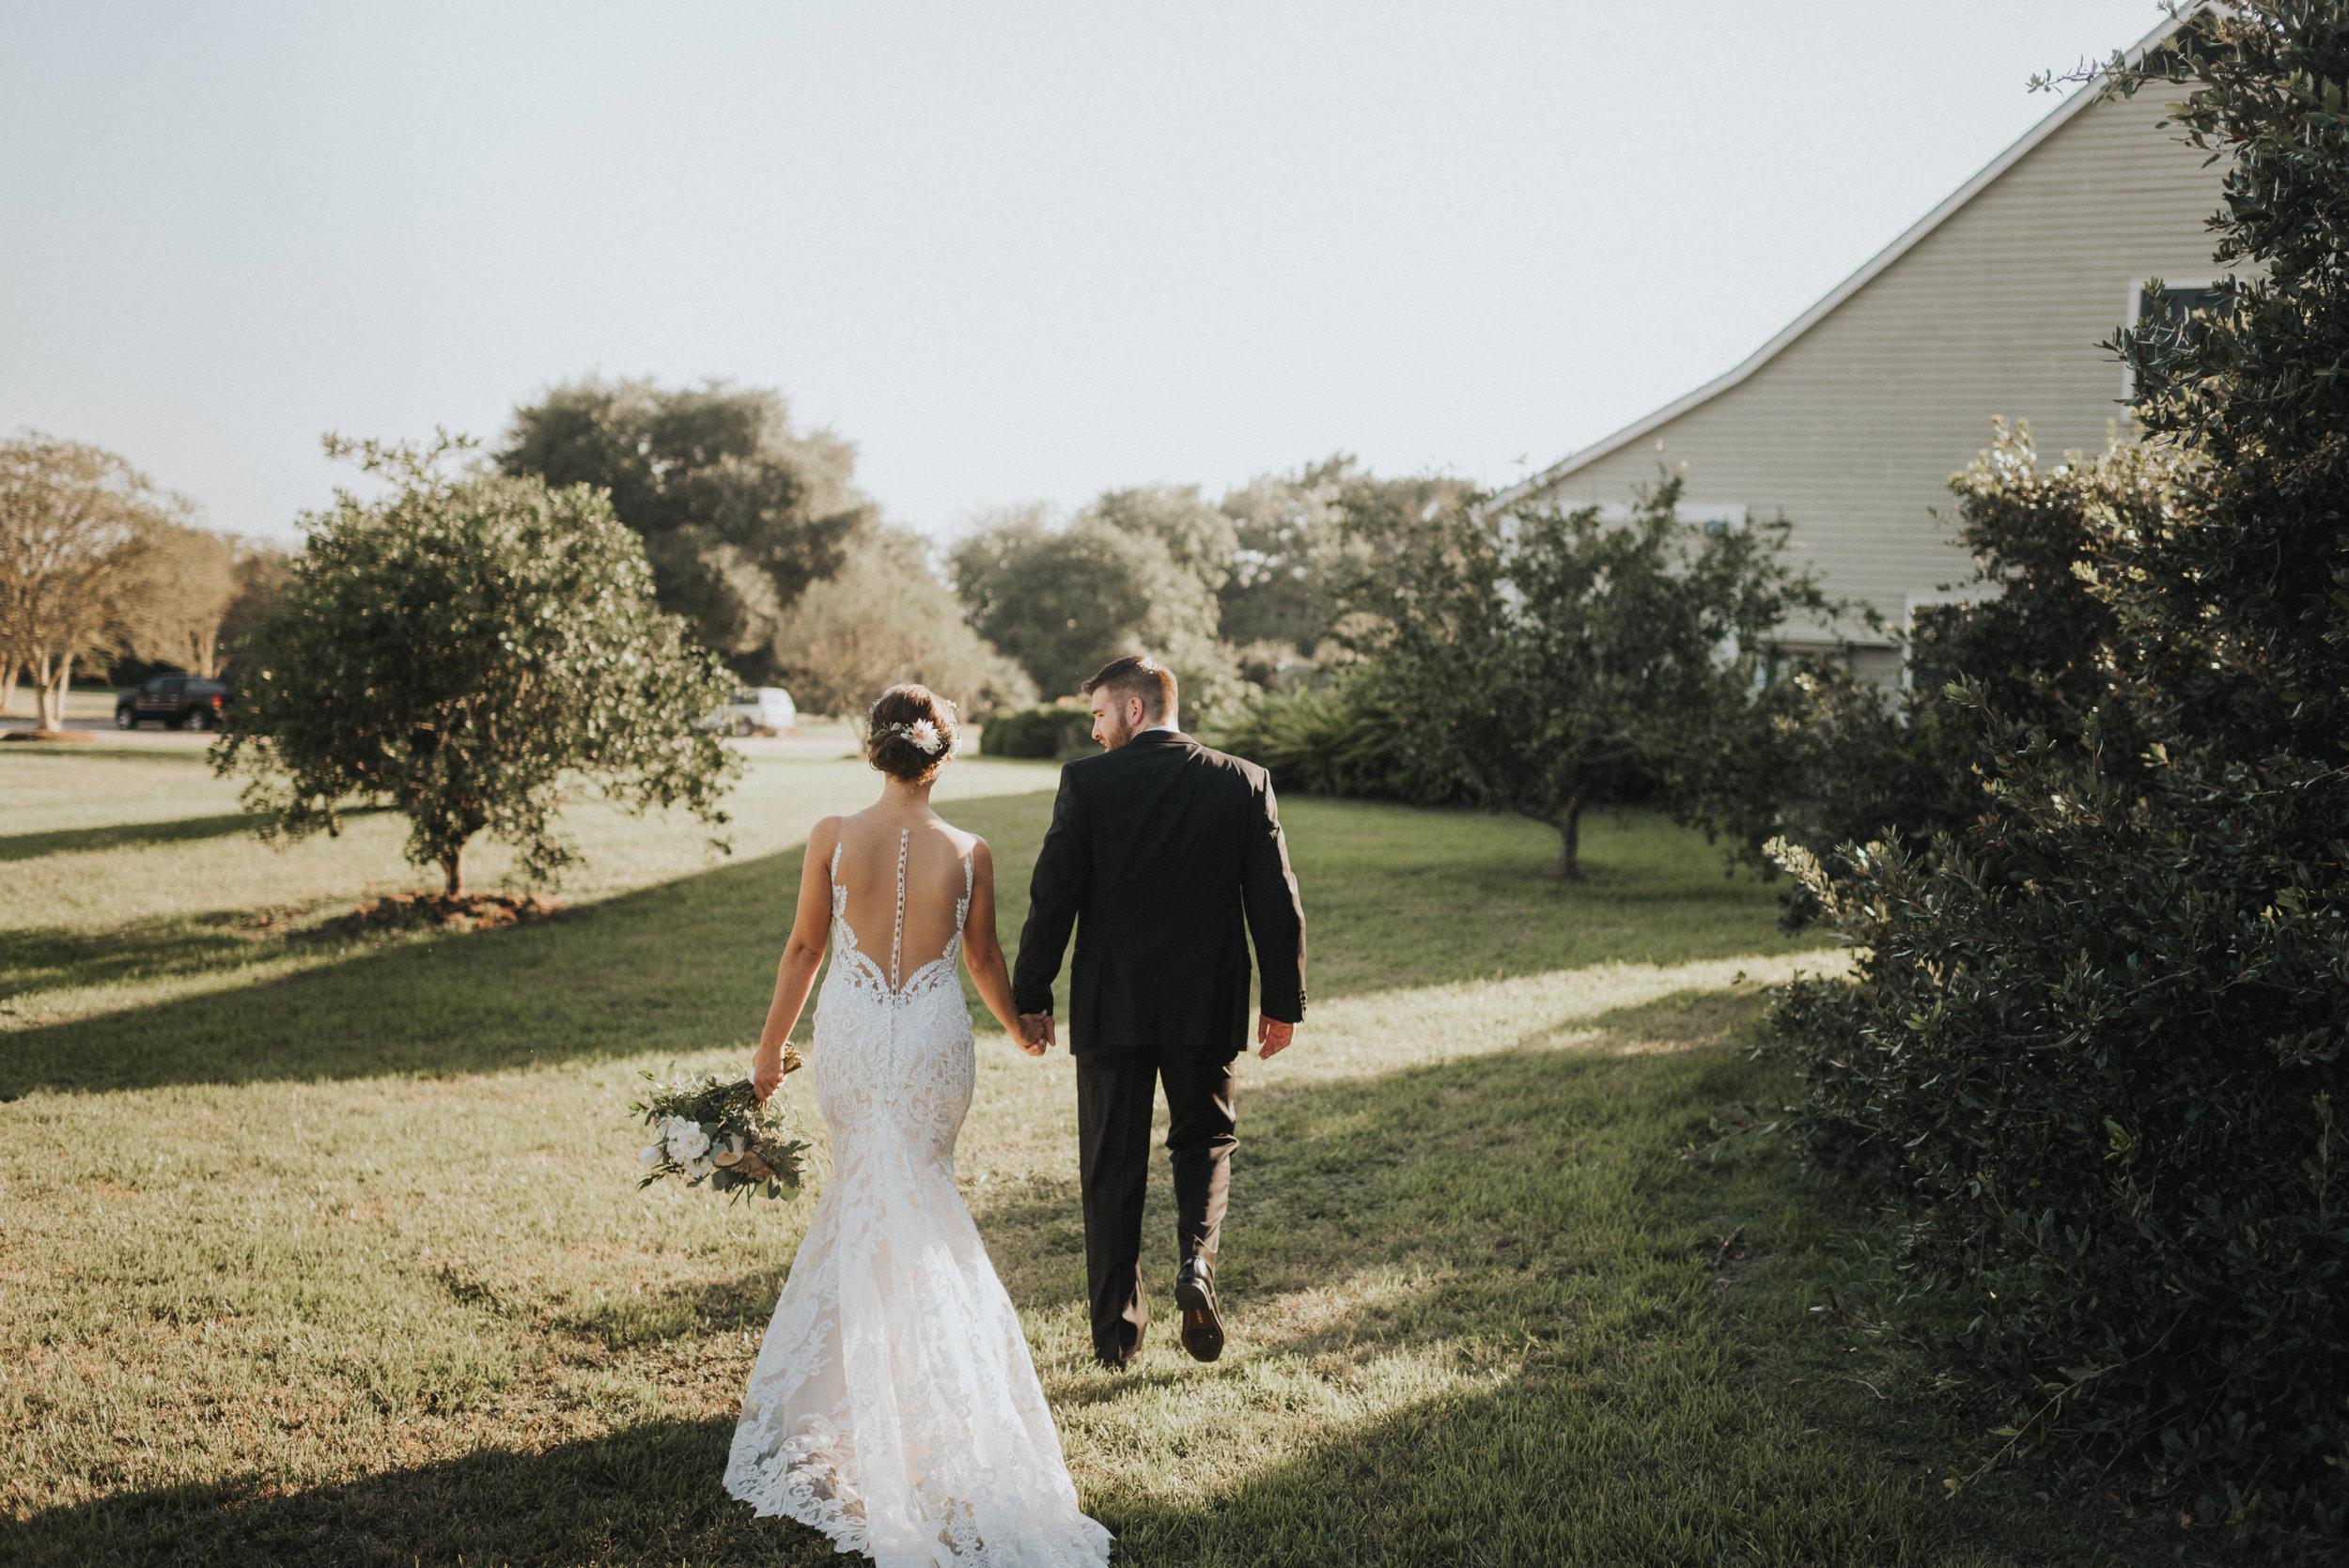 Southern Fete, Southern Wedding, Bride's Wedding dress details